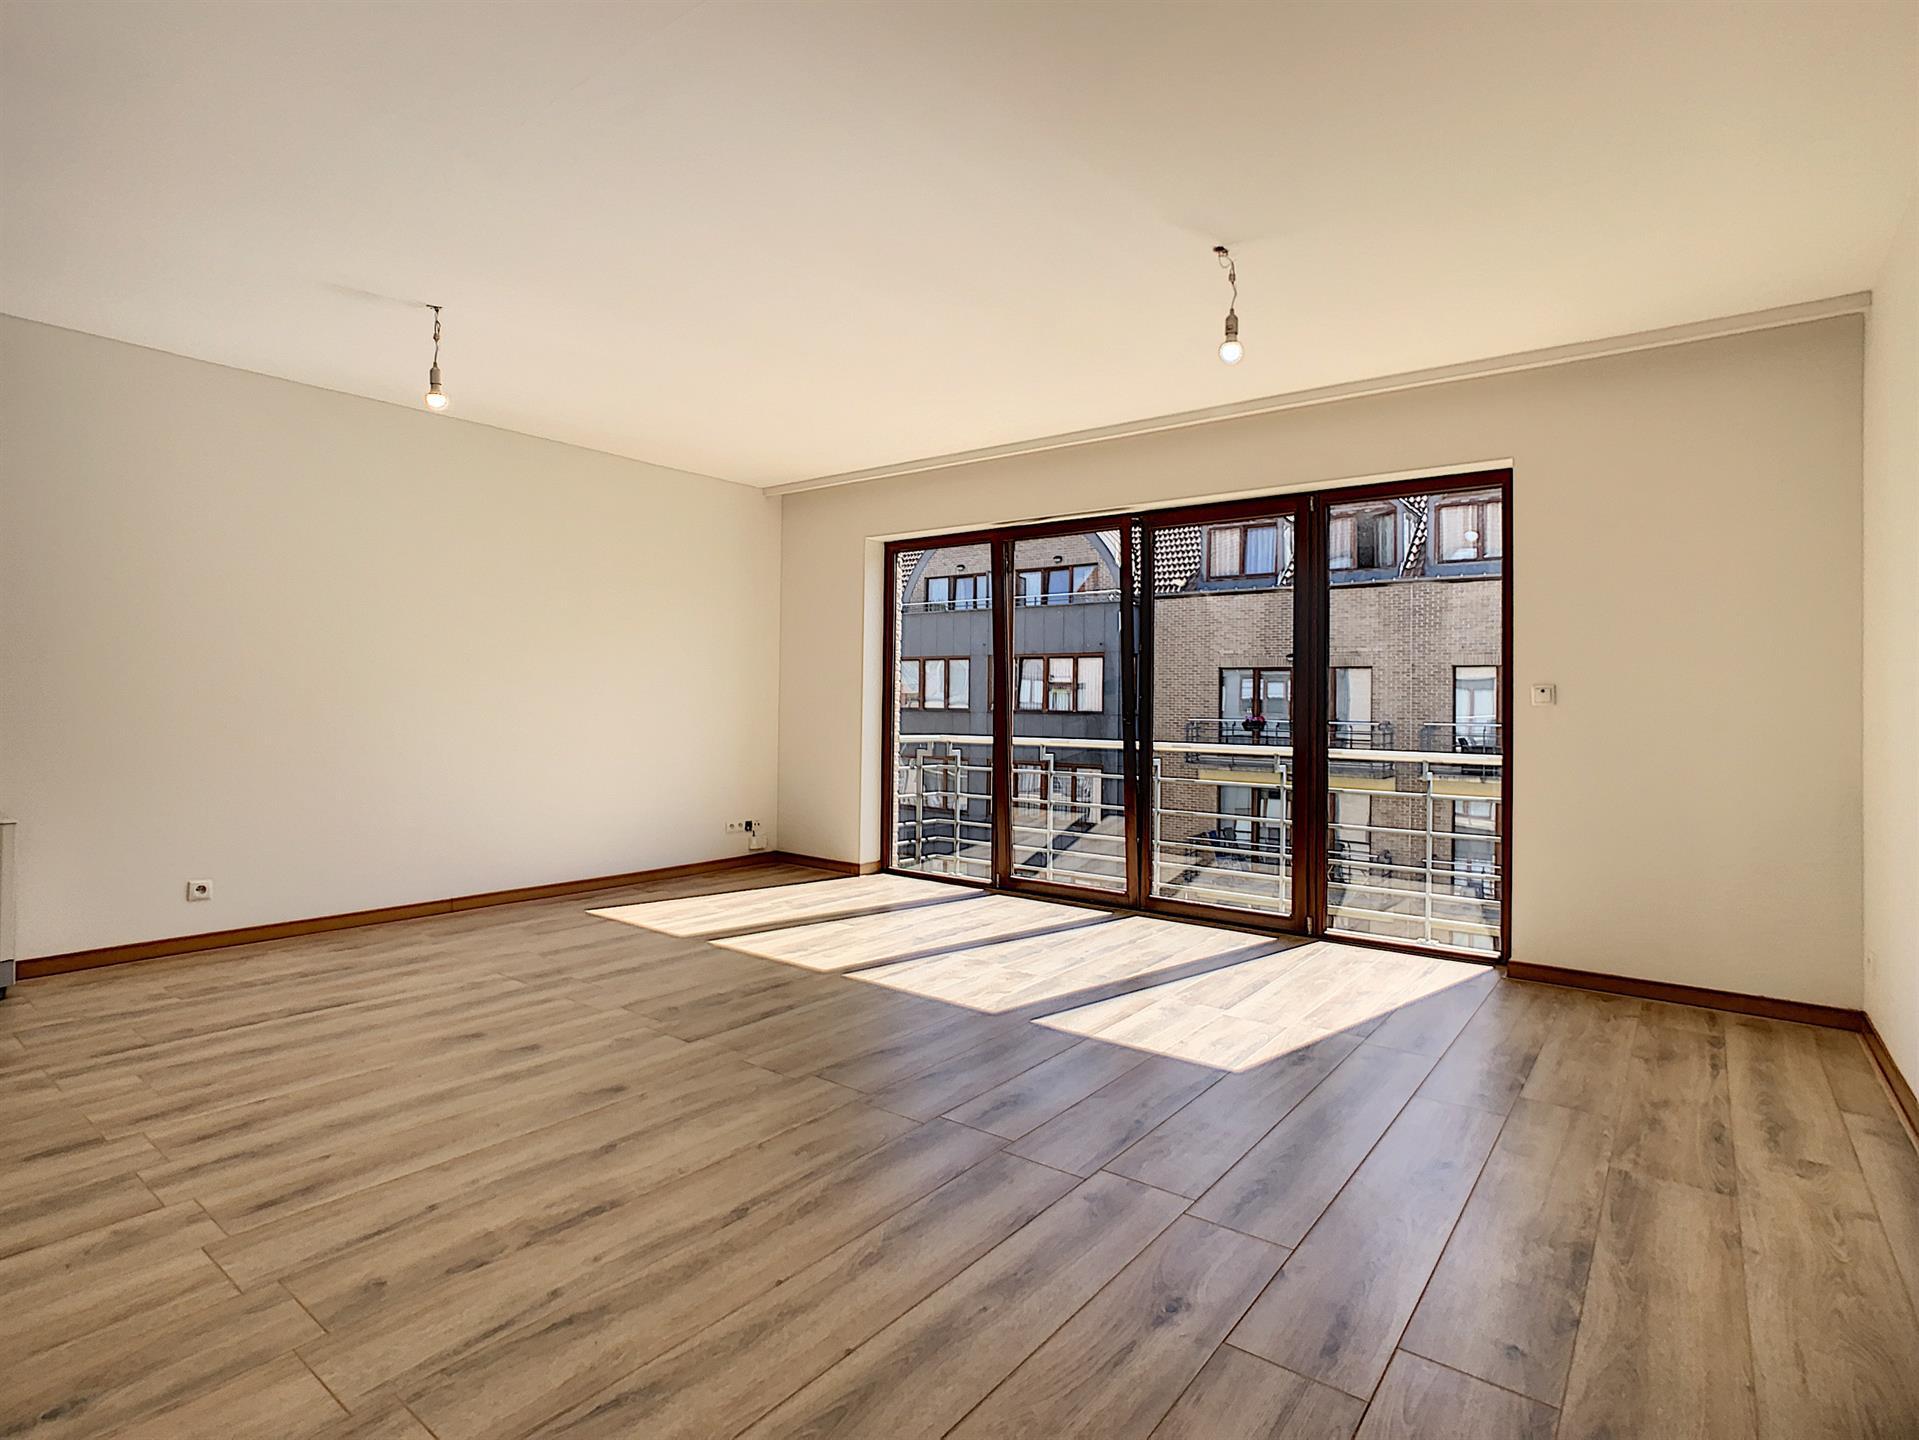 Appartement - Anderlecht - #4390142-1